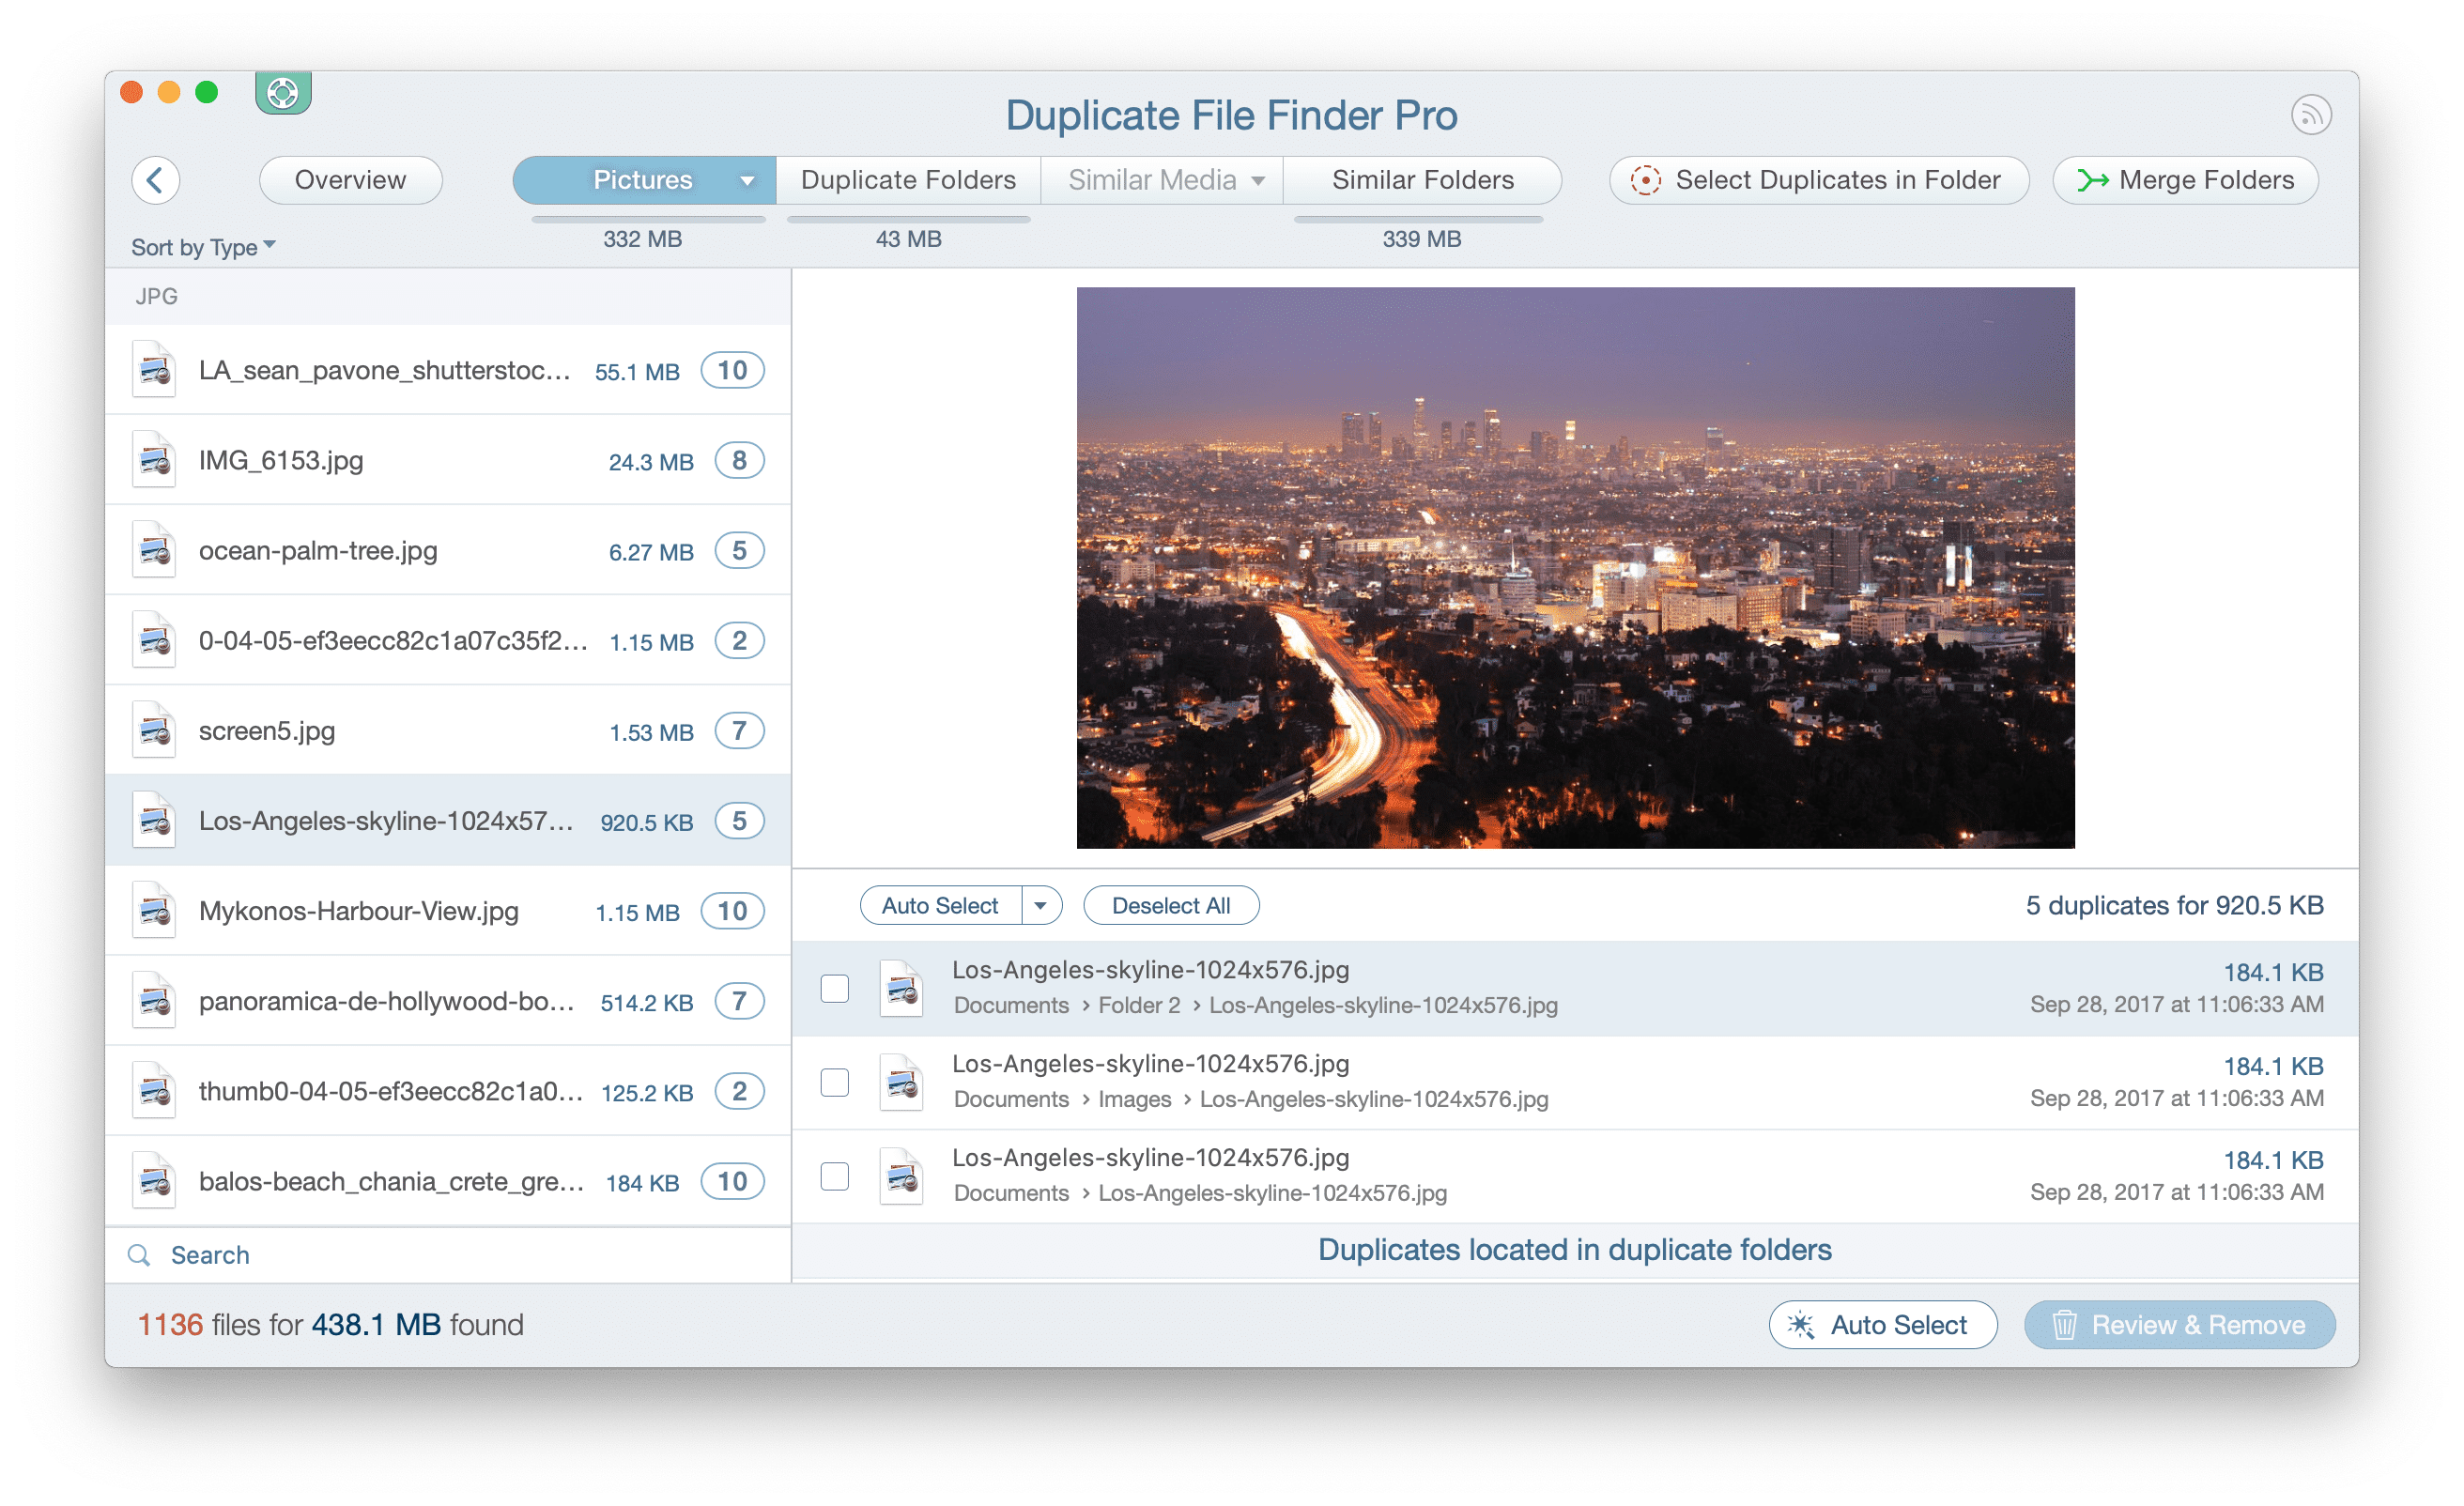 duplicate file finder window showing duplicate pics